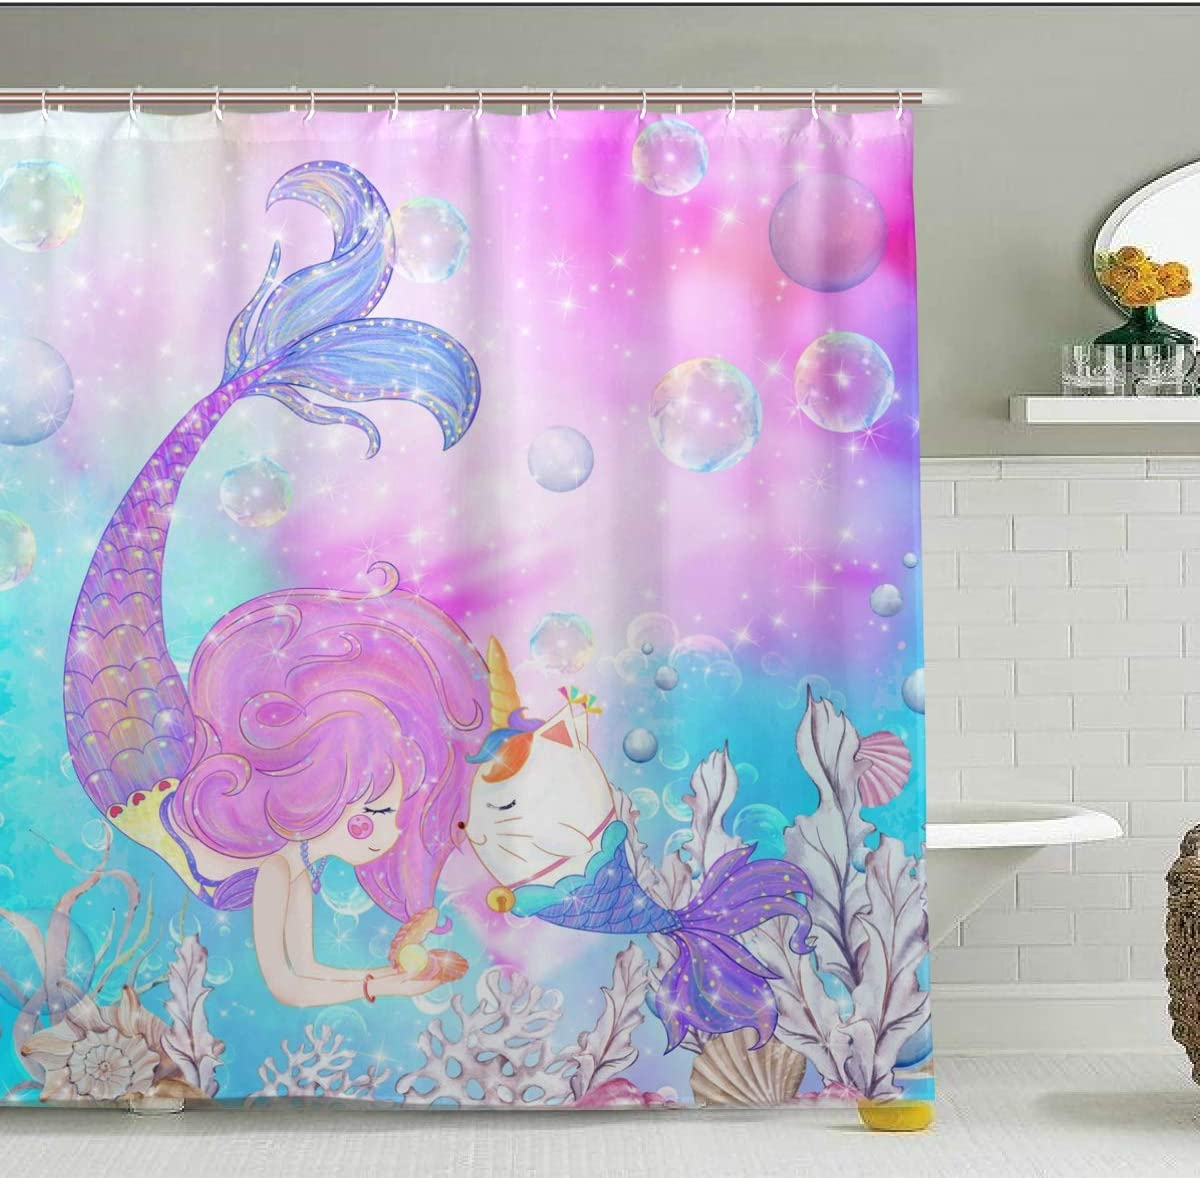 Zoeo Girls Mermaid Shower Curtain Unicorn Cat Fish Fabric Waterproof Large Window Bathroom Tub Curtains Sets Mermaid Home Decor 12 Hooks 72x72 Inch Home Kitchen Amazon Com